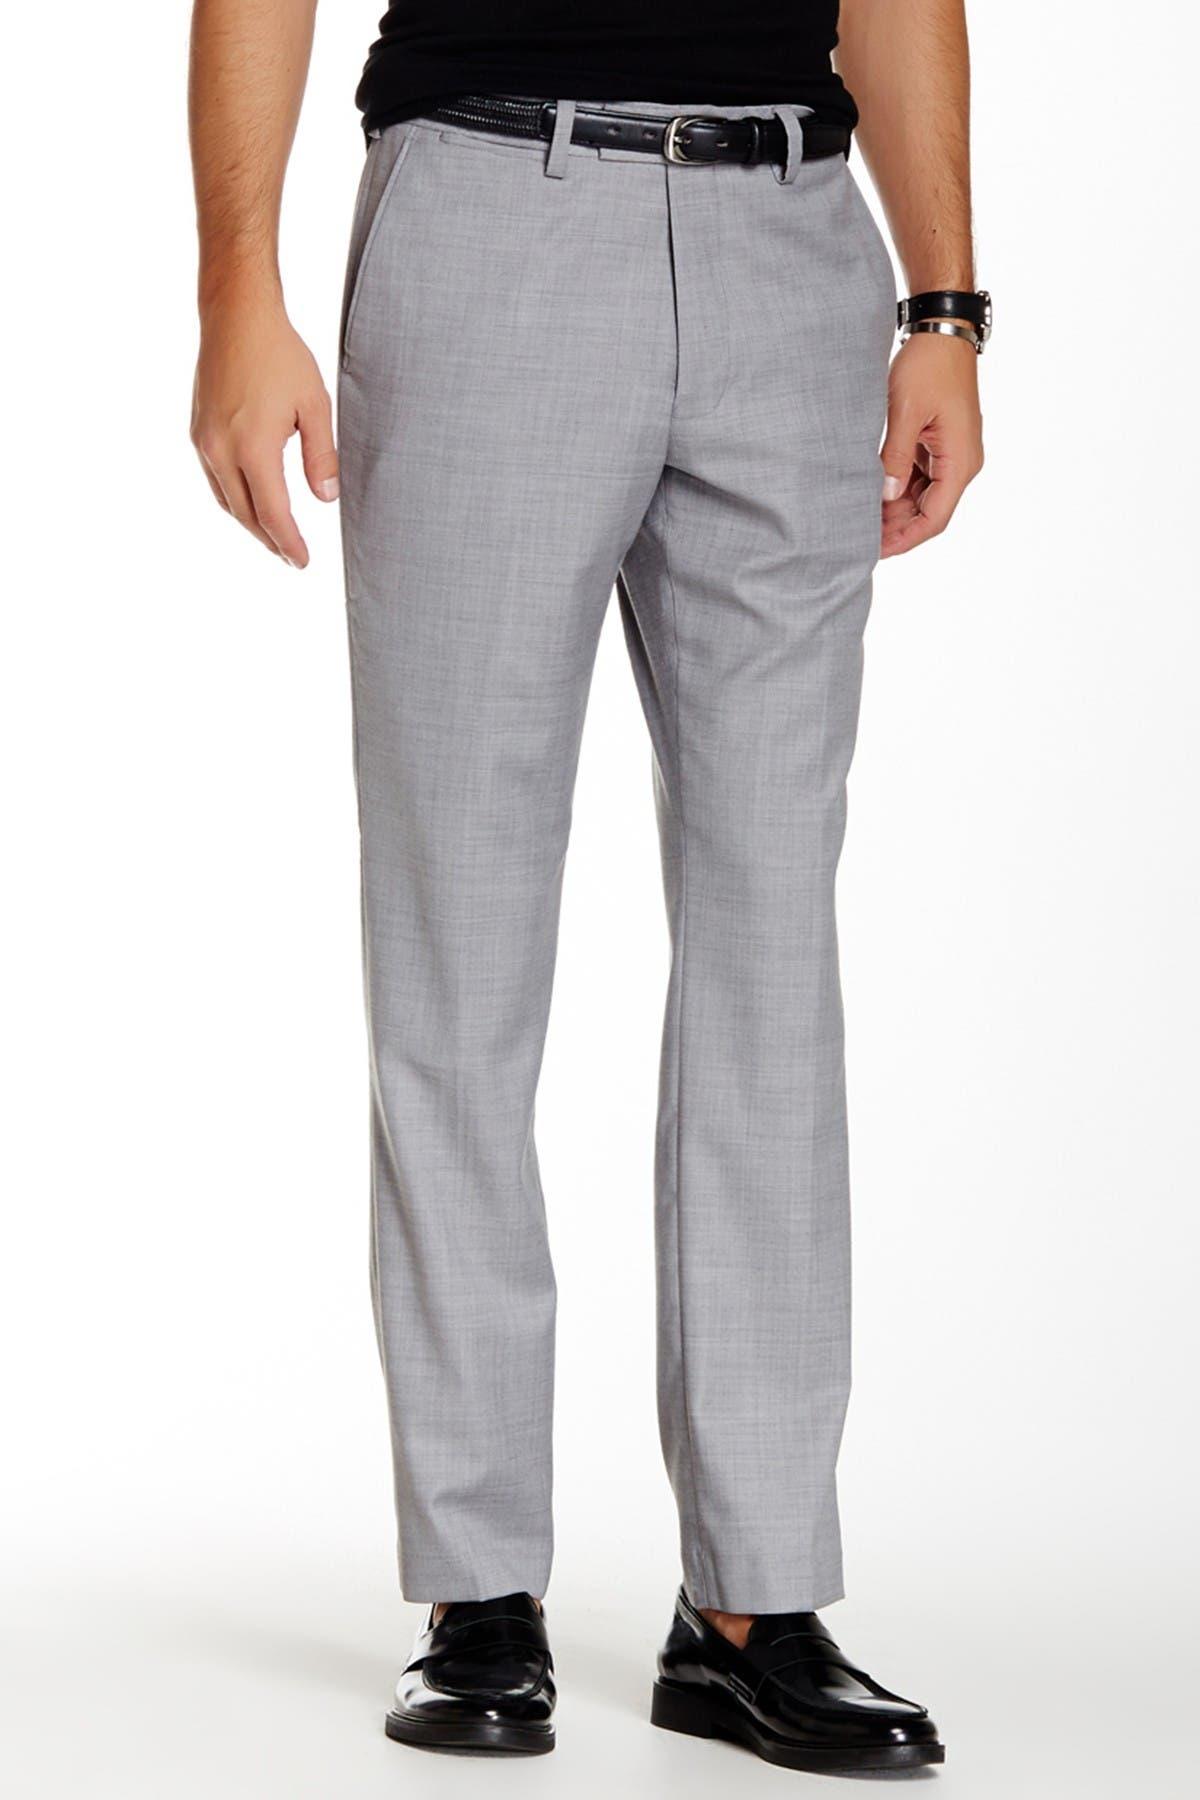 "Image of Louis Raphael Solid Stretch Dress Slim Fit Pants - 30-34"" Inseam"